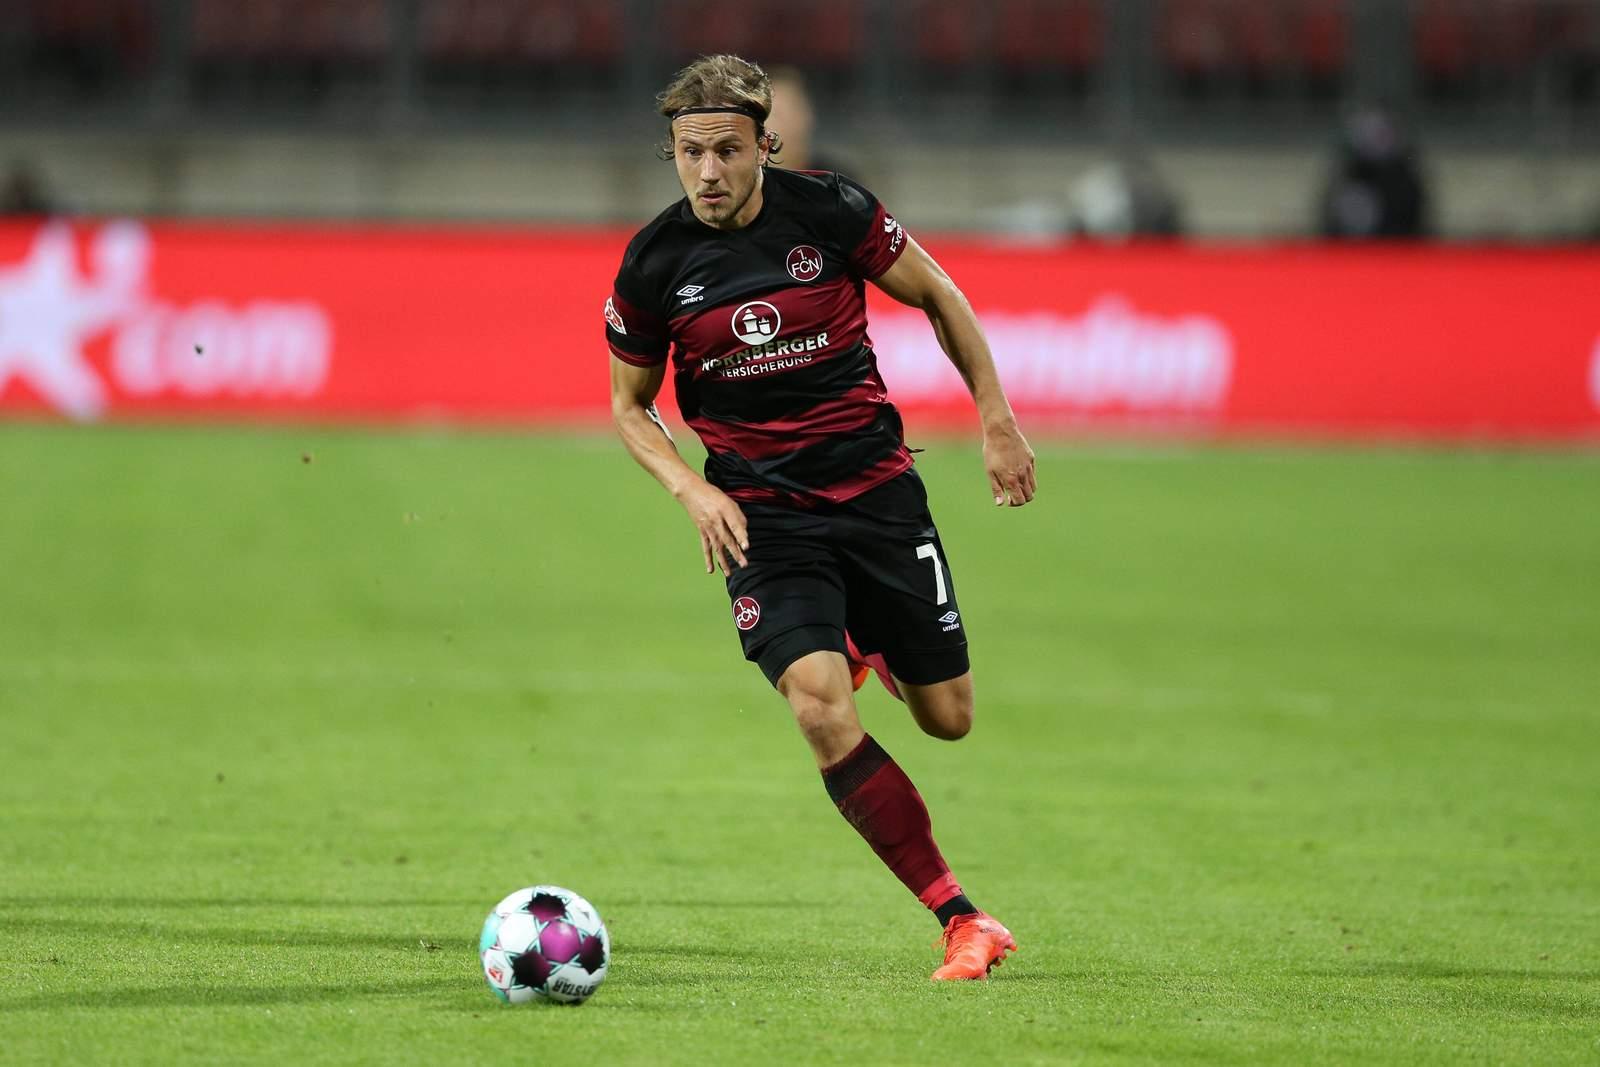 Felix Lohkemper im Spiel gegen Darmstadt.